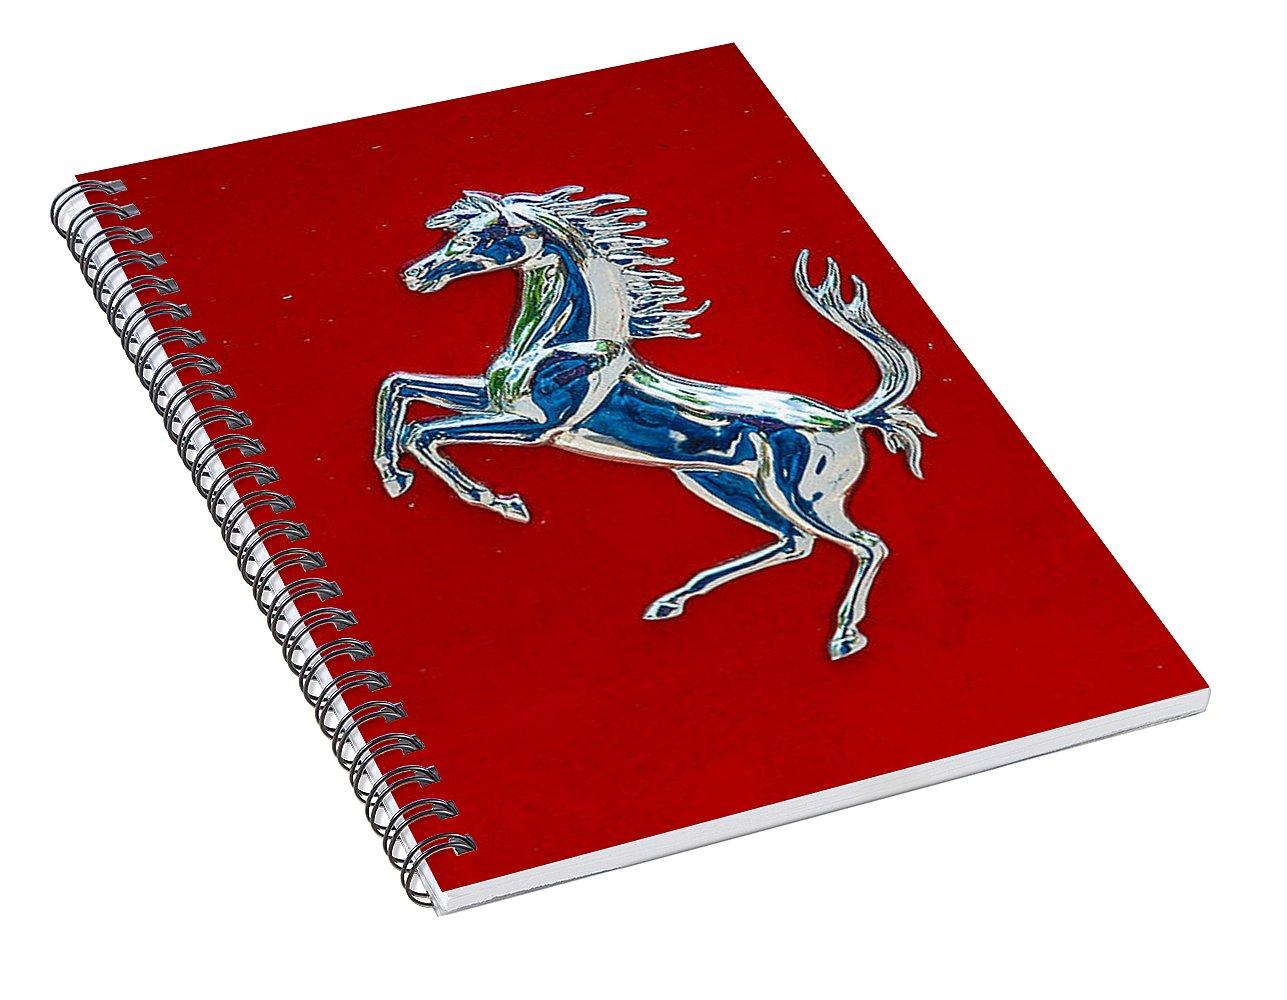 Prancing Horse Ferrari Symbol Spiral Notebook For Sale By Dany Lison